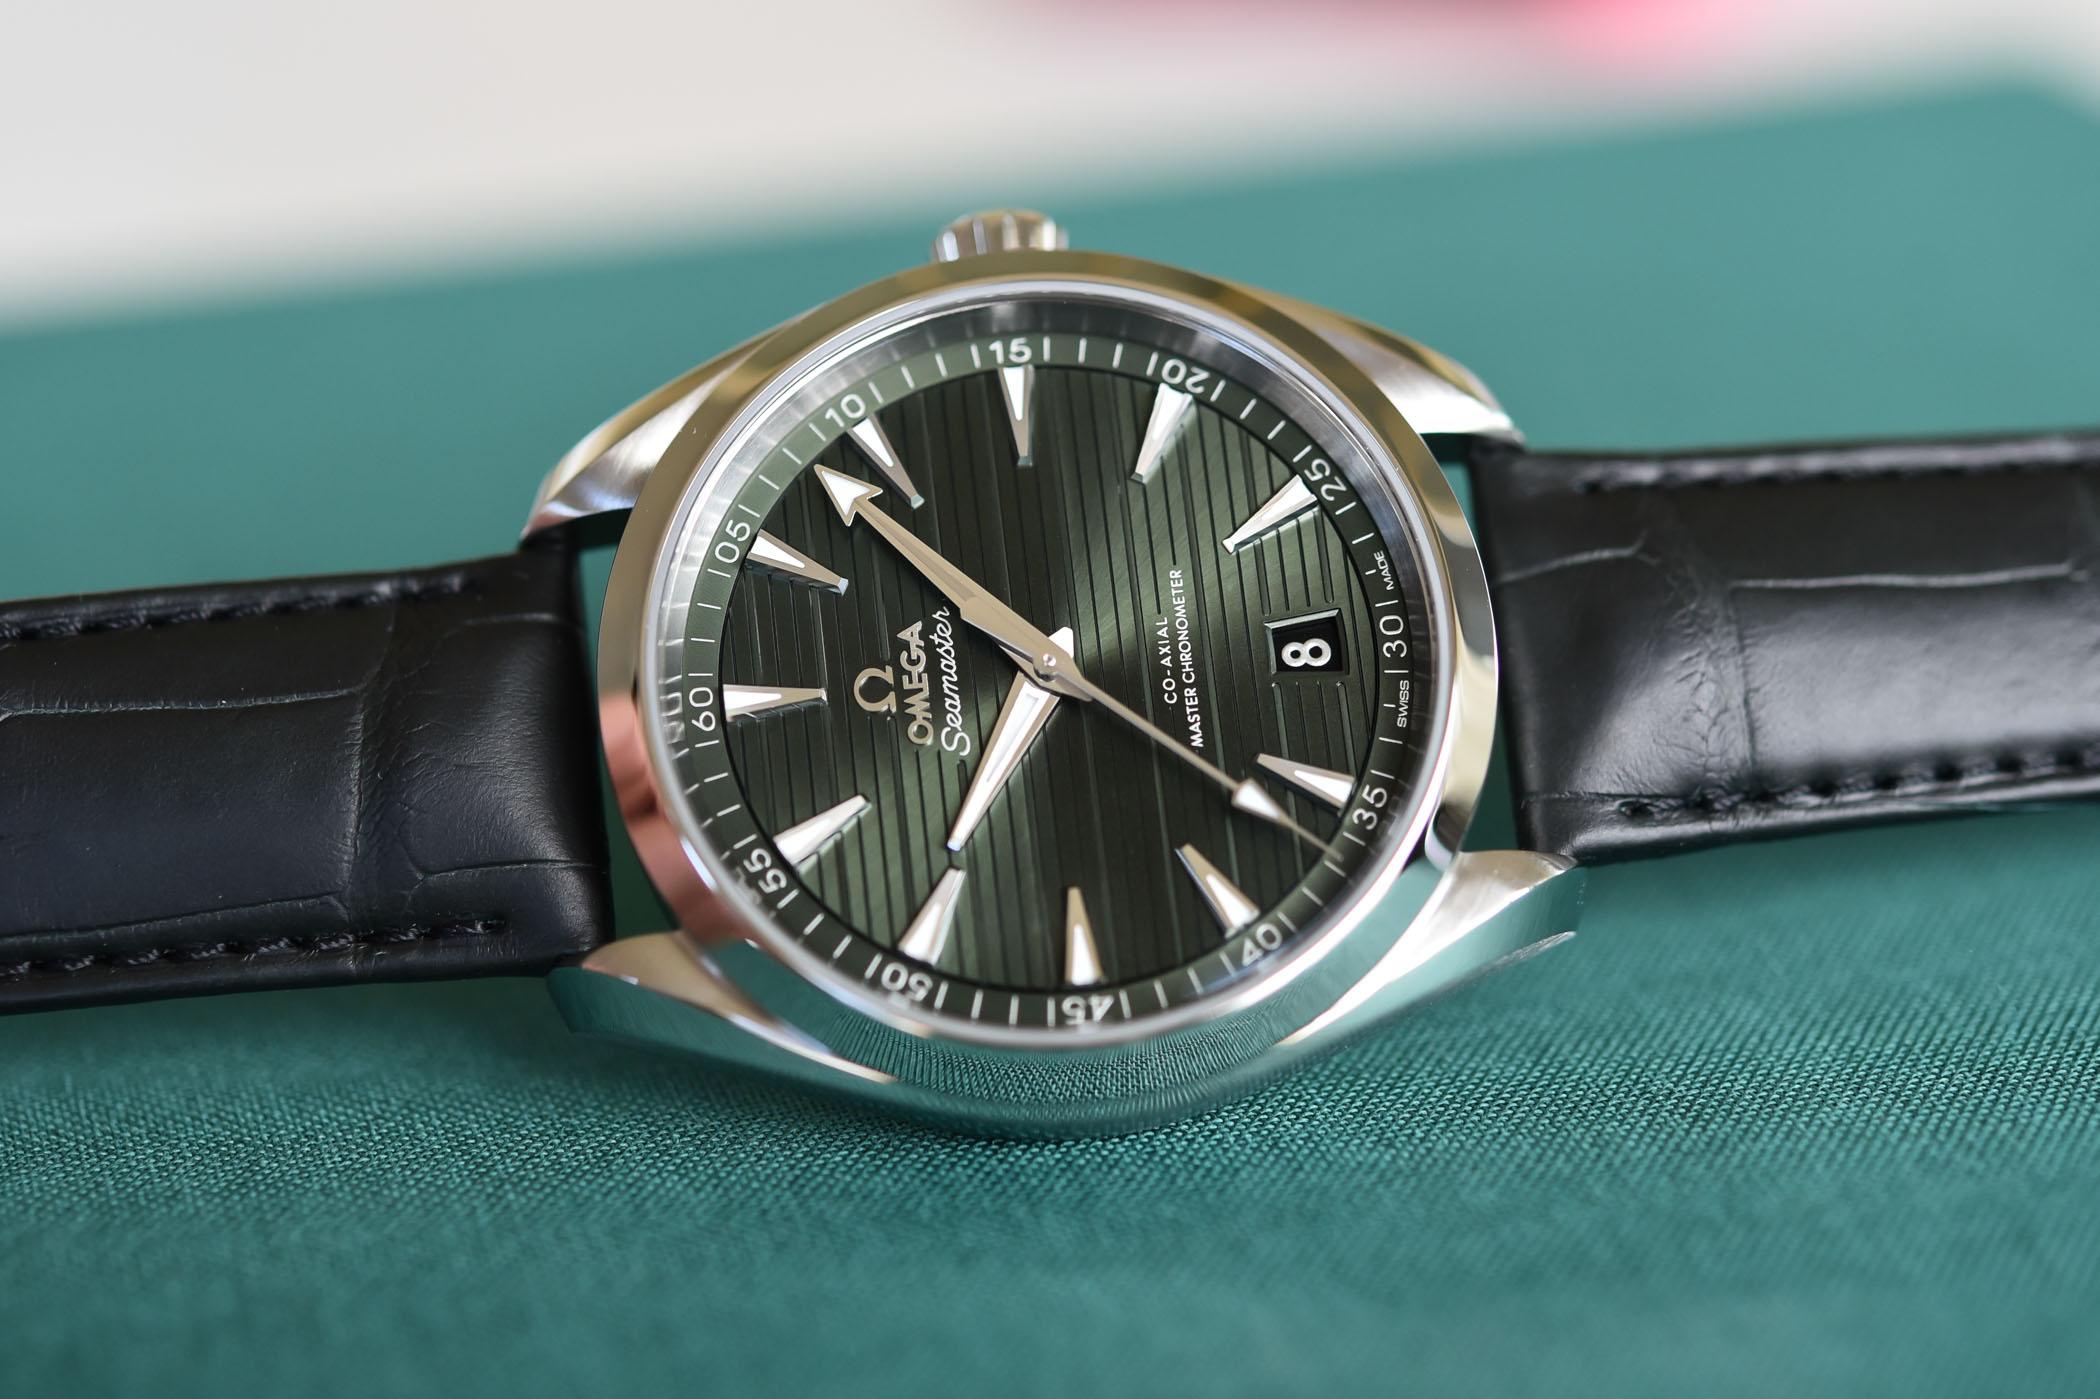 Otra vista del Omega Seamaster Aqua Terra 150M Master Chronometer